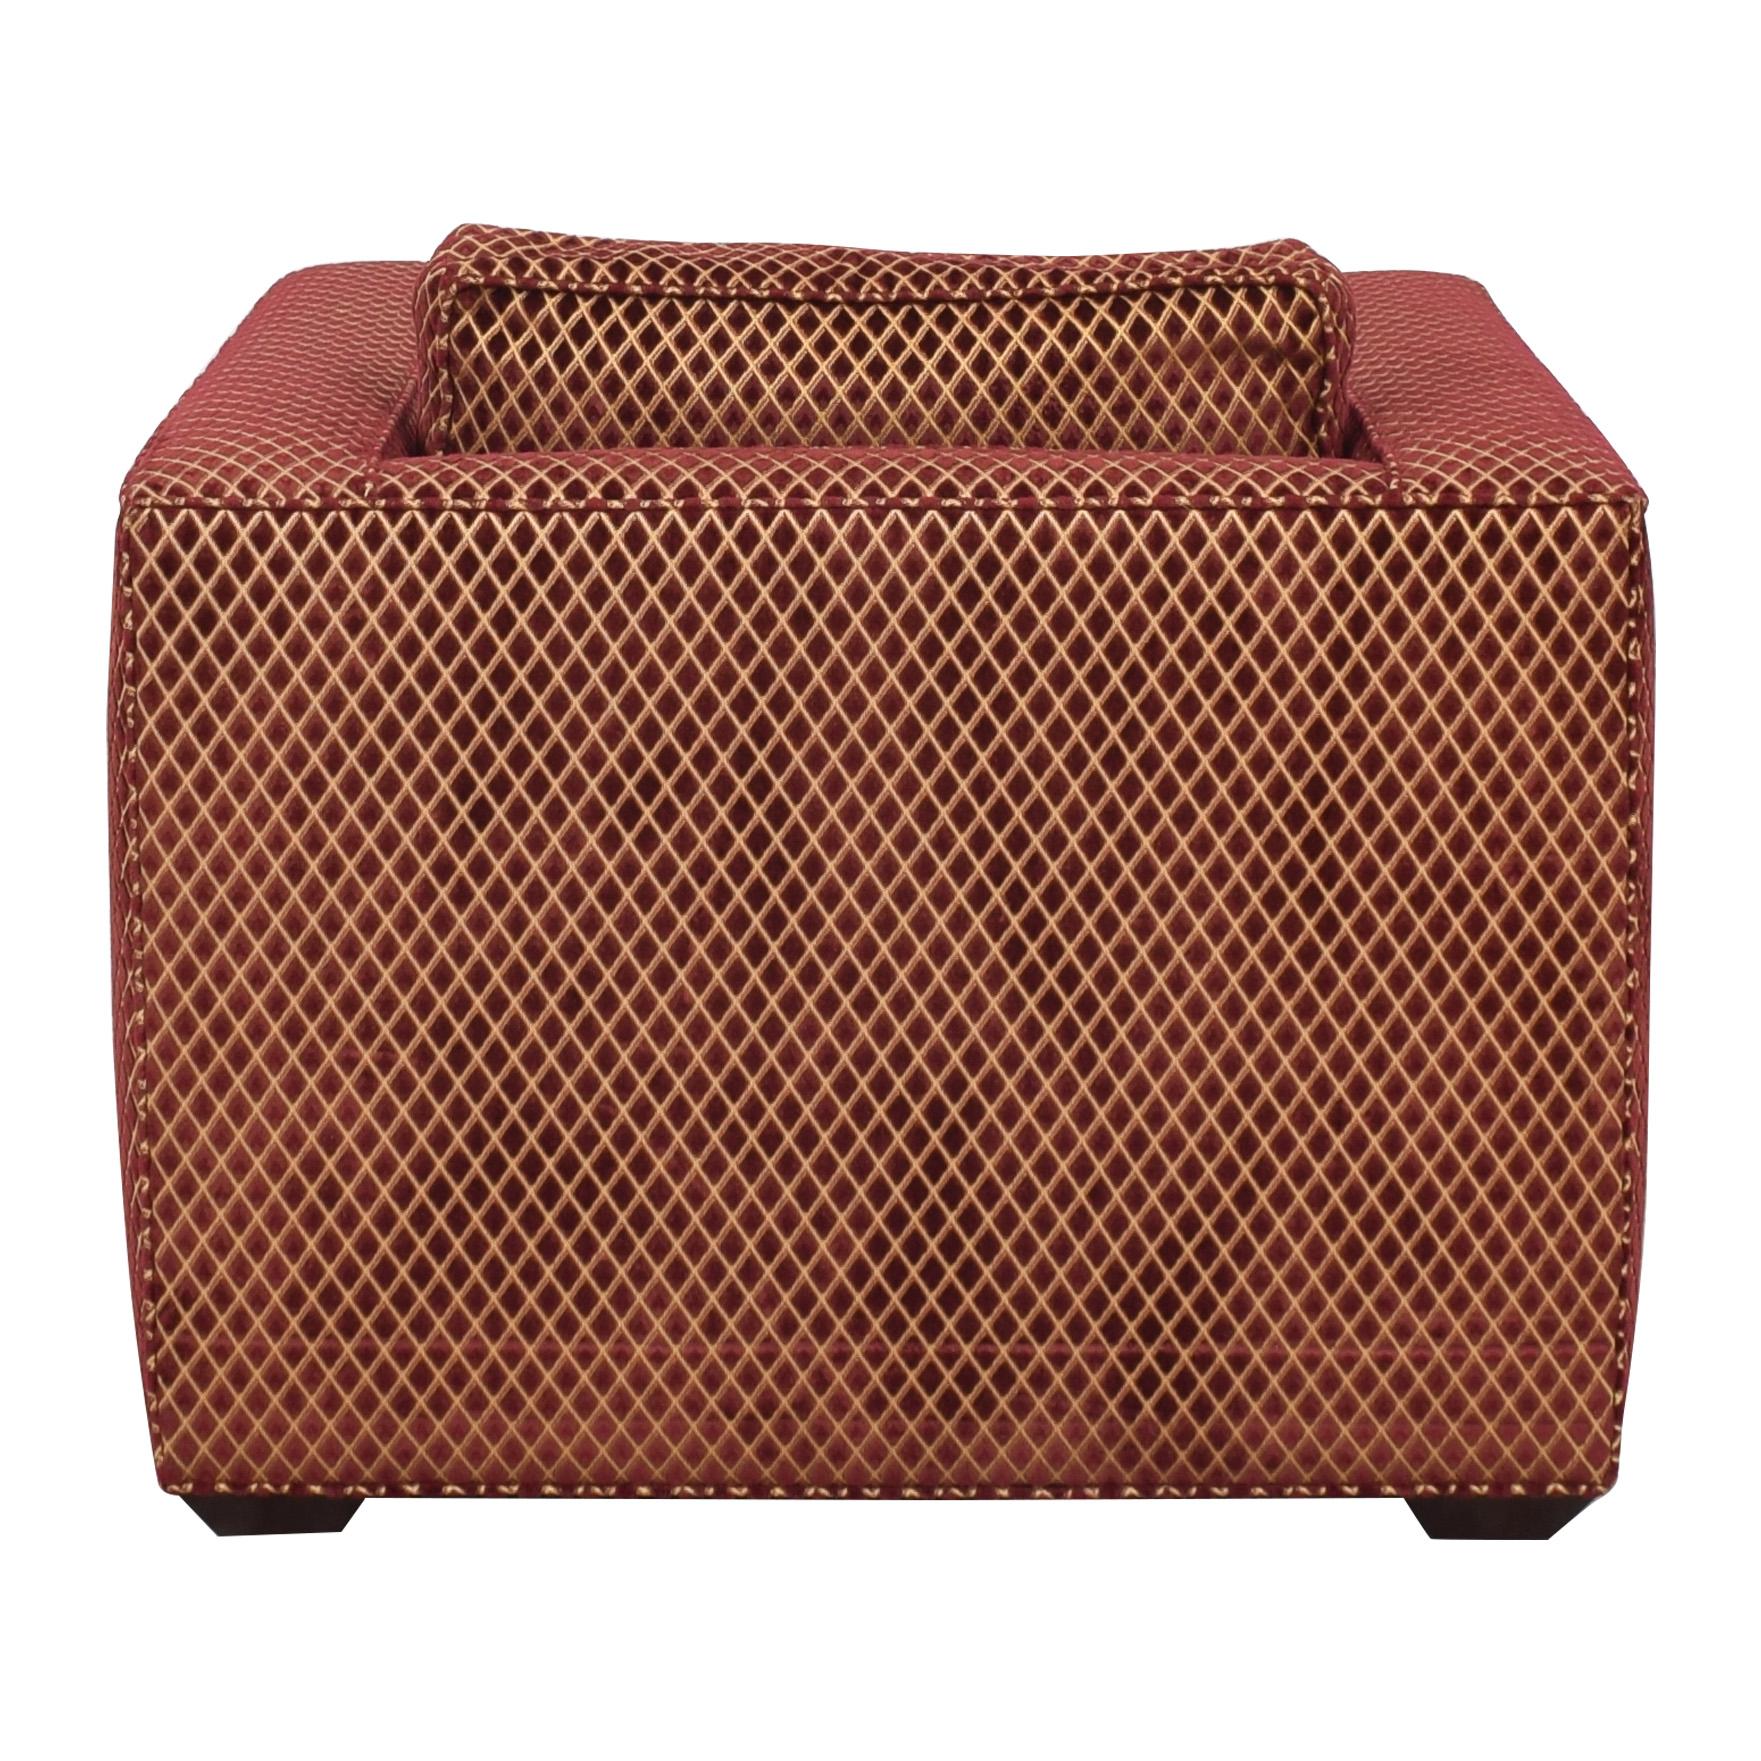 R.Jones Club Lounge Chair sale